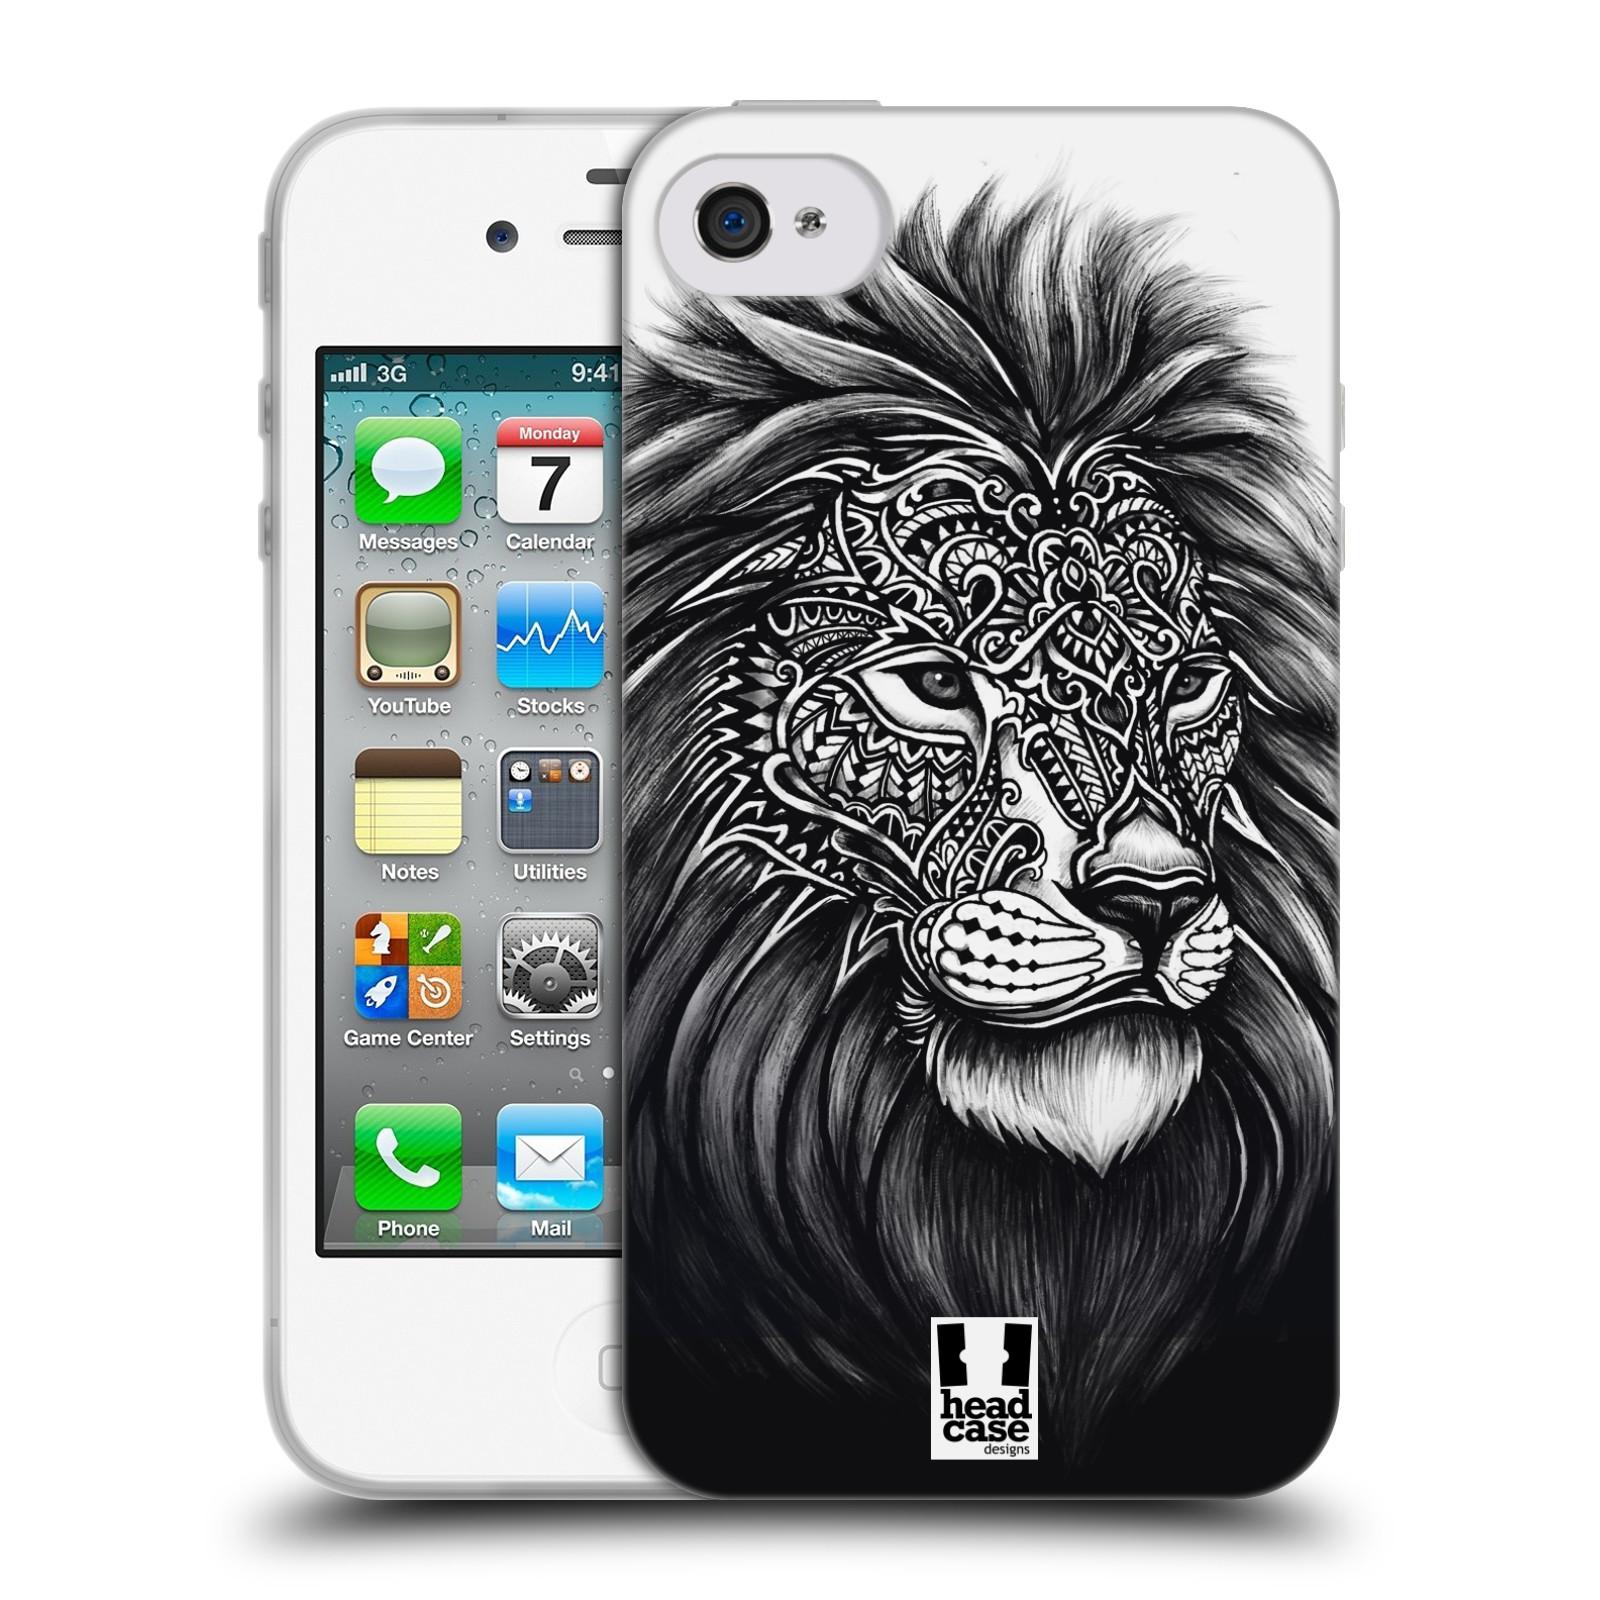 Silikonové pouzdro na mobil Apple iPhone 4 a 4S HEAD CASE Zdobený Lev (Silikonový kryt či obal na mobilní telefon Apple iPhone 4 a 4S)